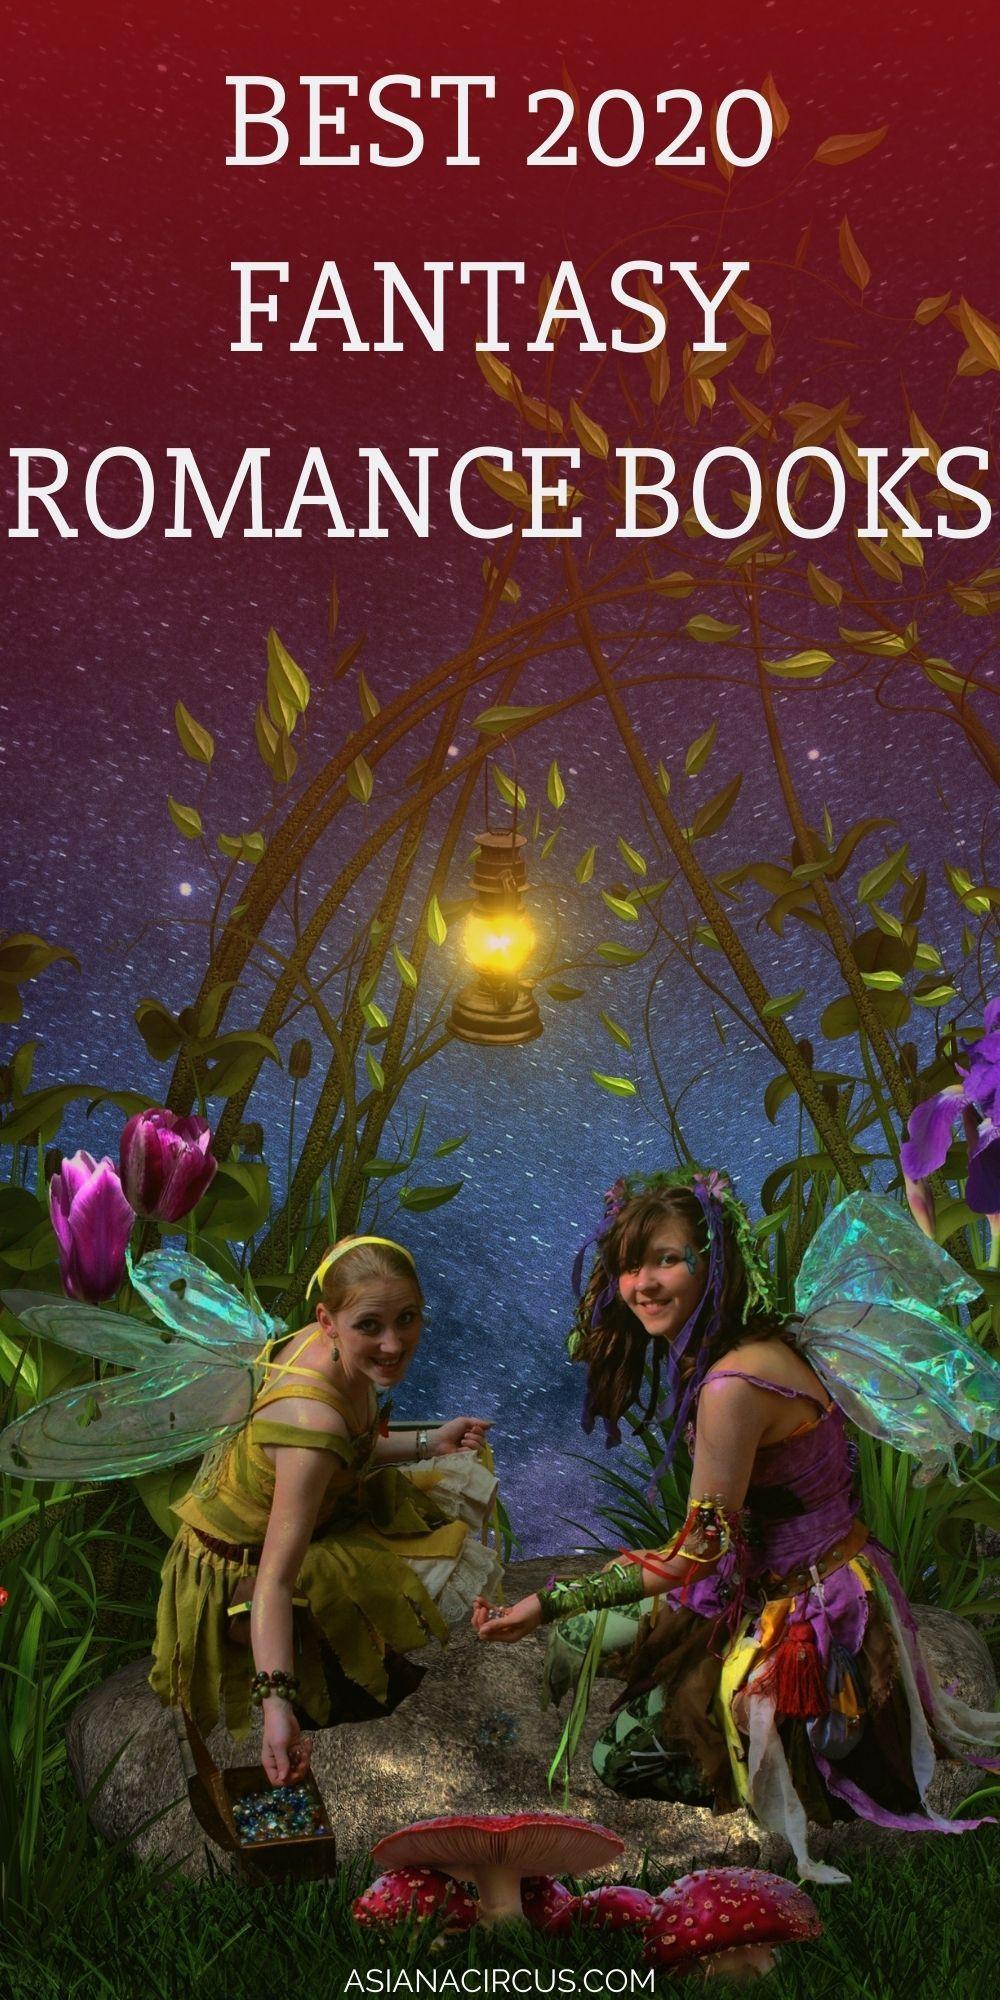 51 Best Romance Fantasy Books Novels To Read 2020 Asiana Circus In 2020 Fantasy Romance Books Romantic Fantasy Book Fantasy Romance Novels